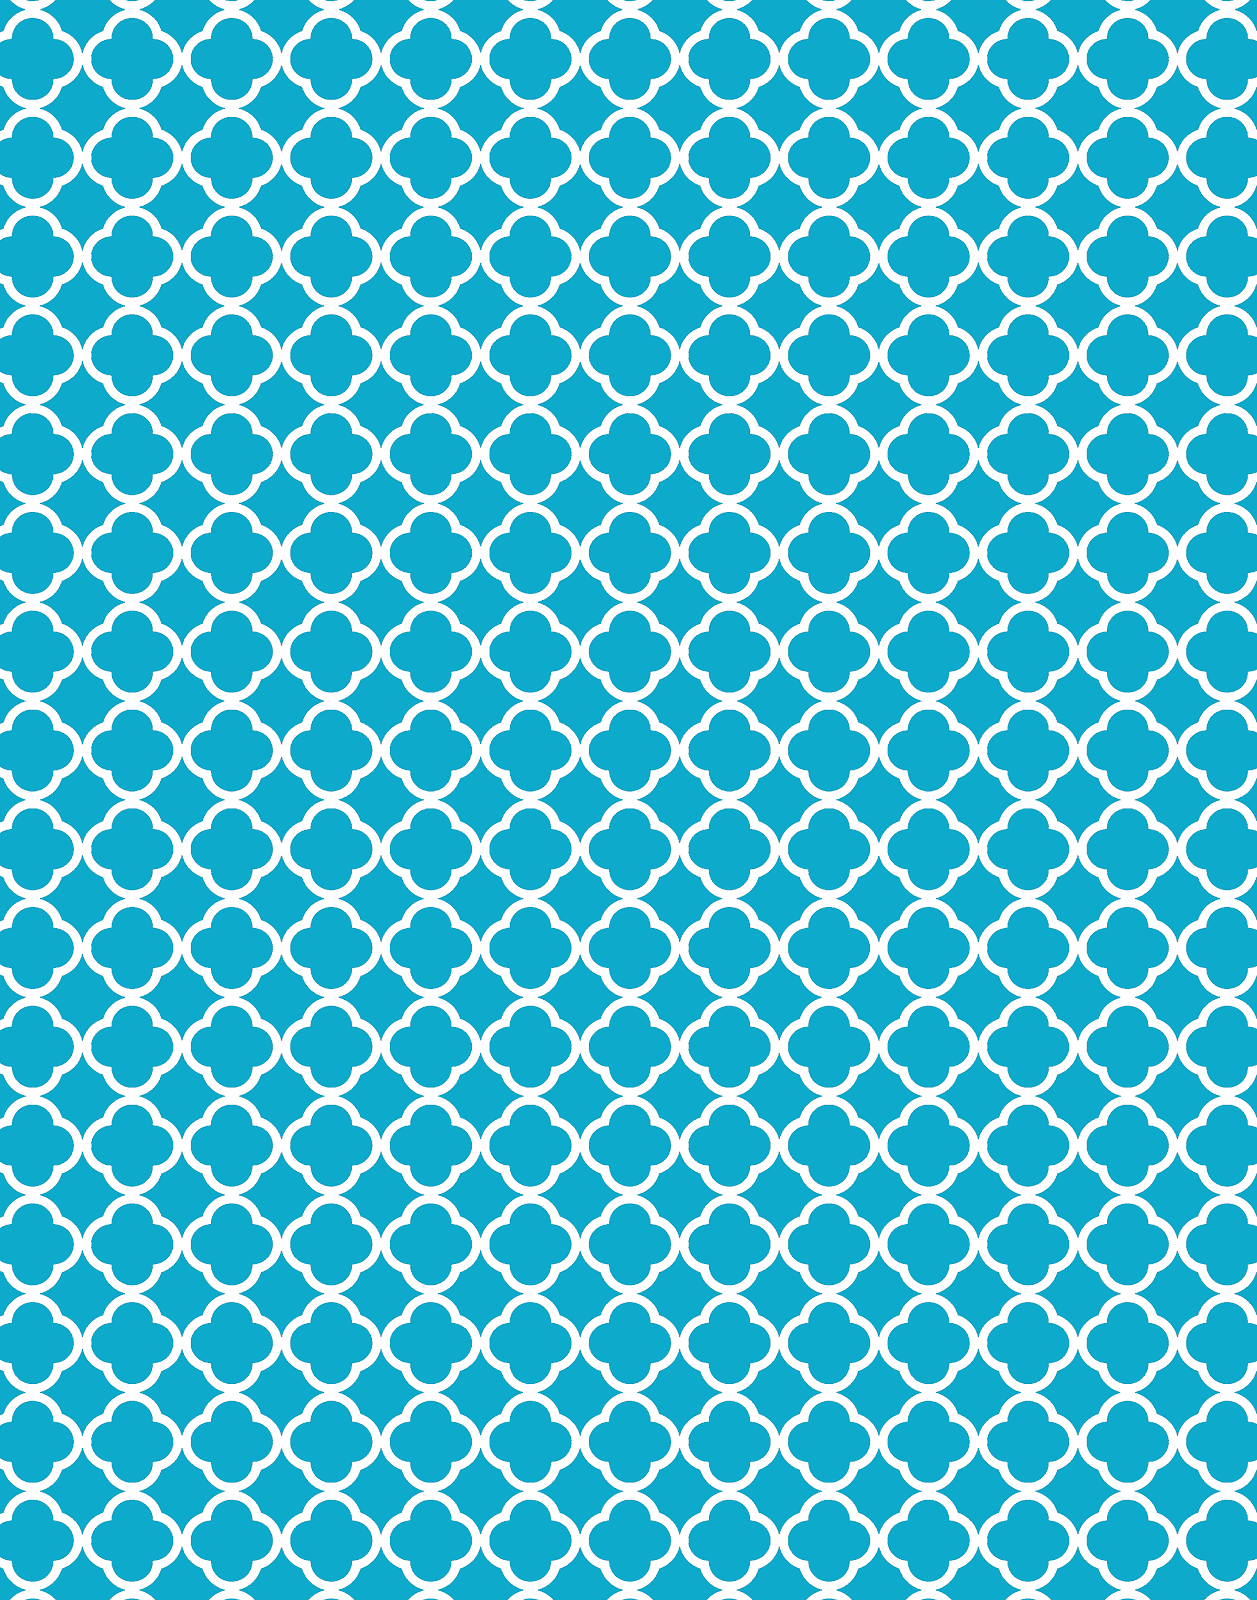 quatrefoil pattern background - photo #7